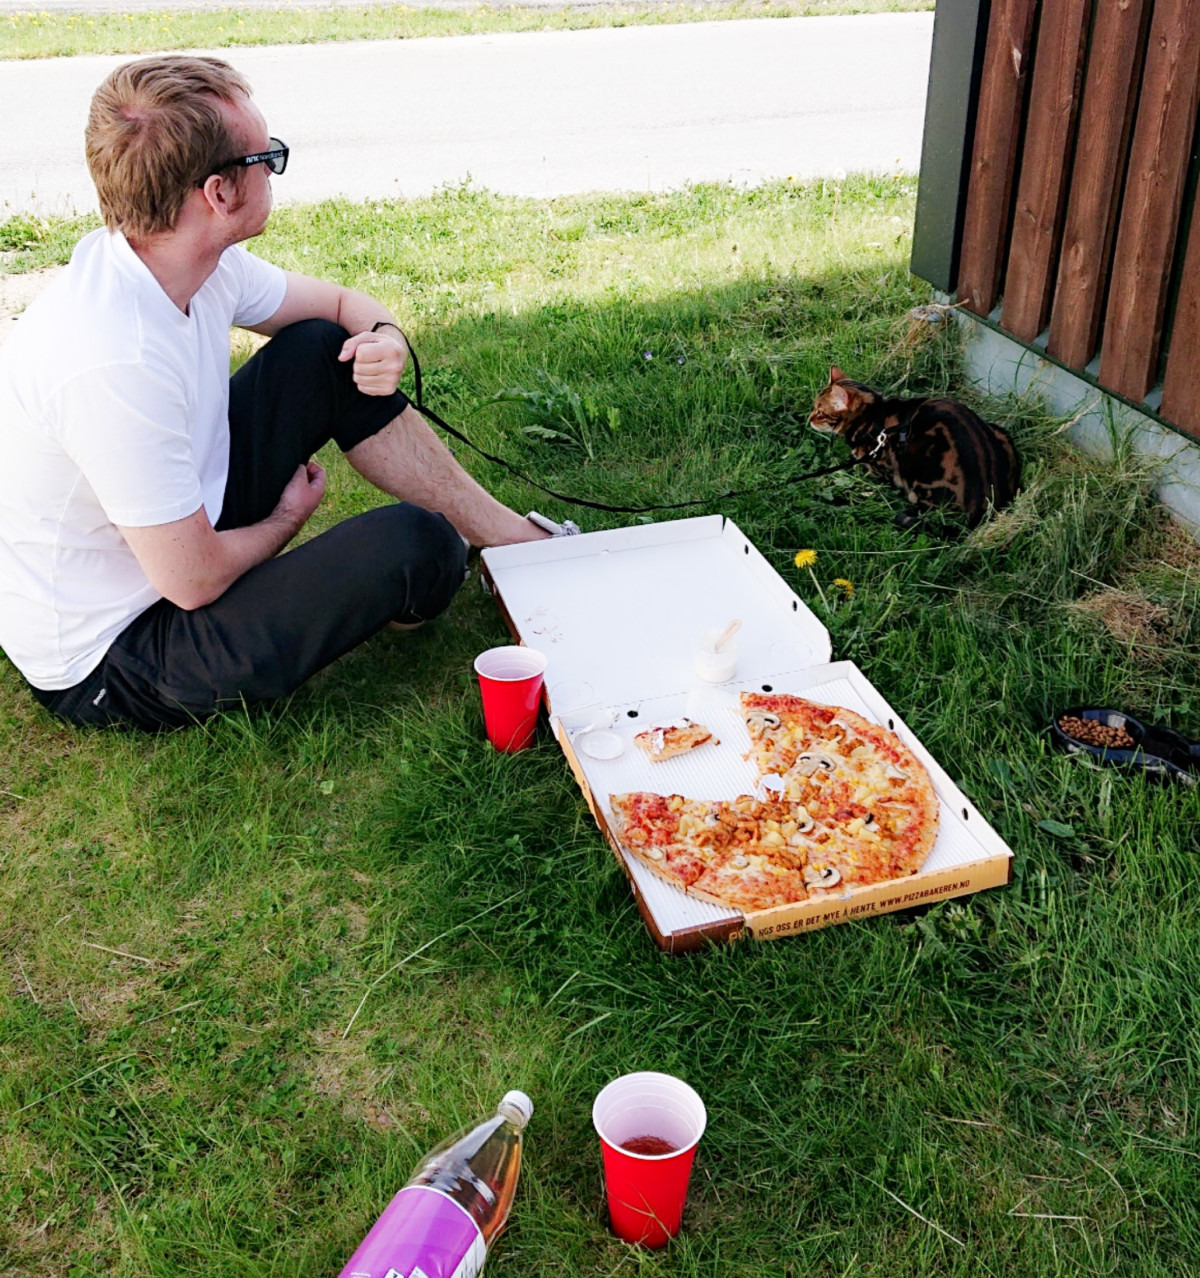 Pizzabakerpicnic